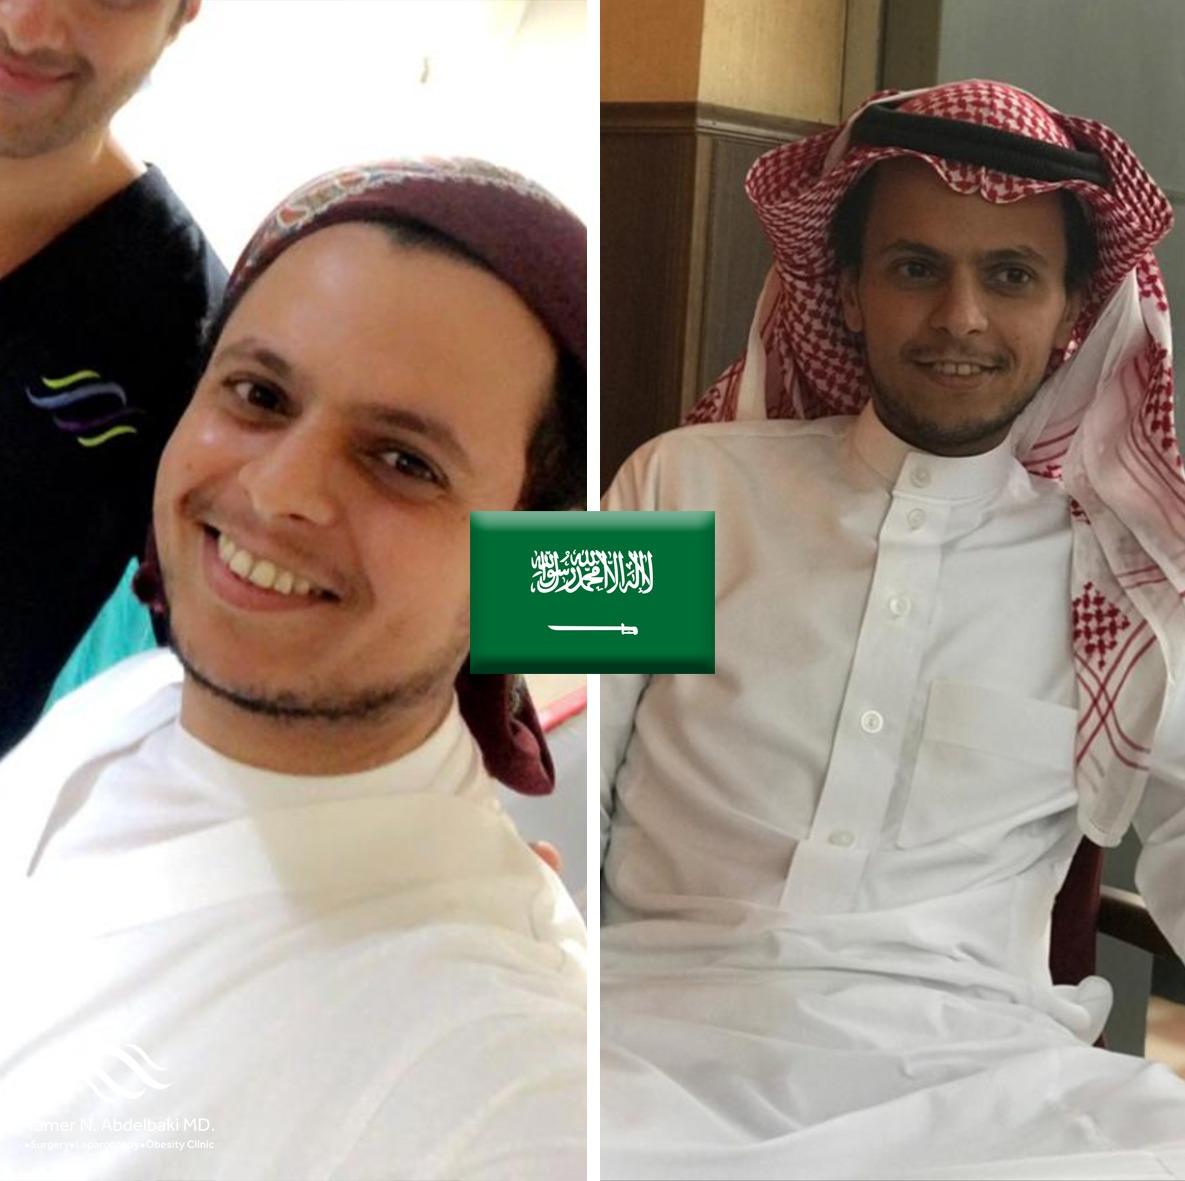 Abd Elaziz Fawzan